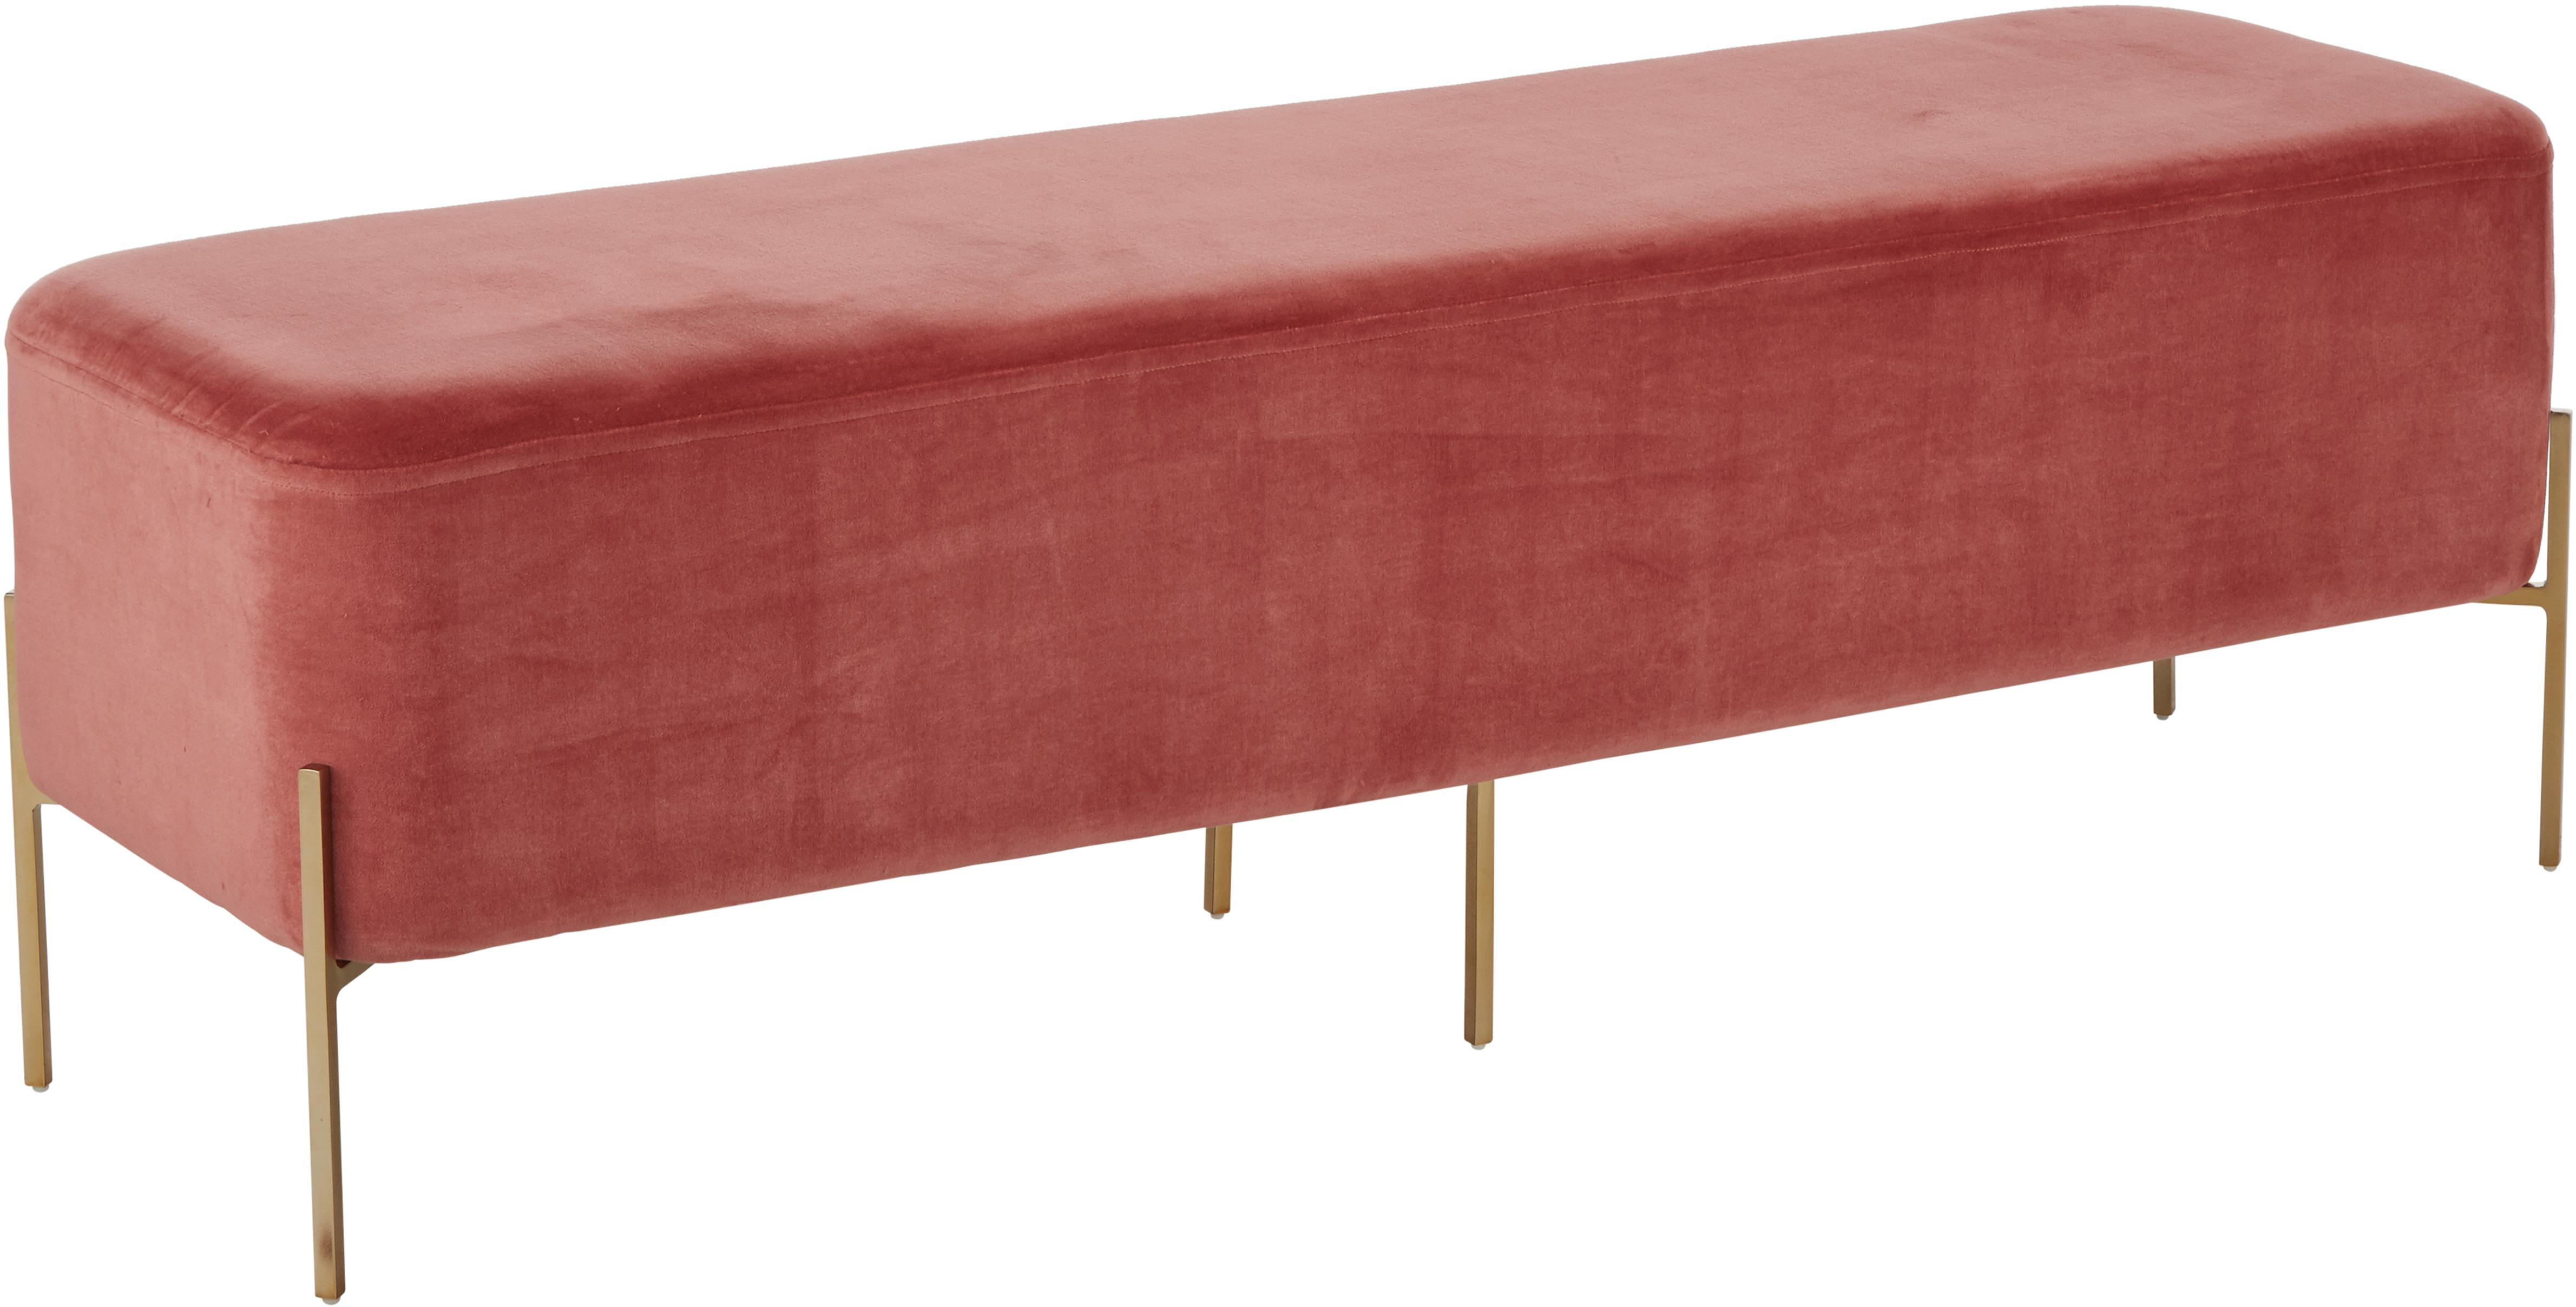 Panca imbottita in velluto Harper, Rivestimento: velluto, Rivestimento: terracotta base: dorato, opaco, Larg. 140 x Alt. 45 cm